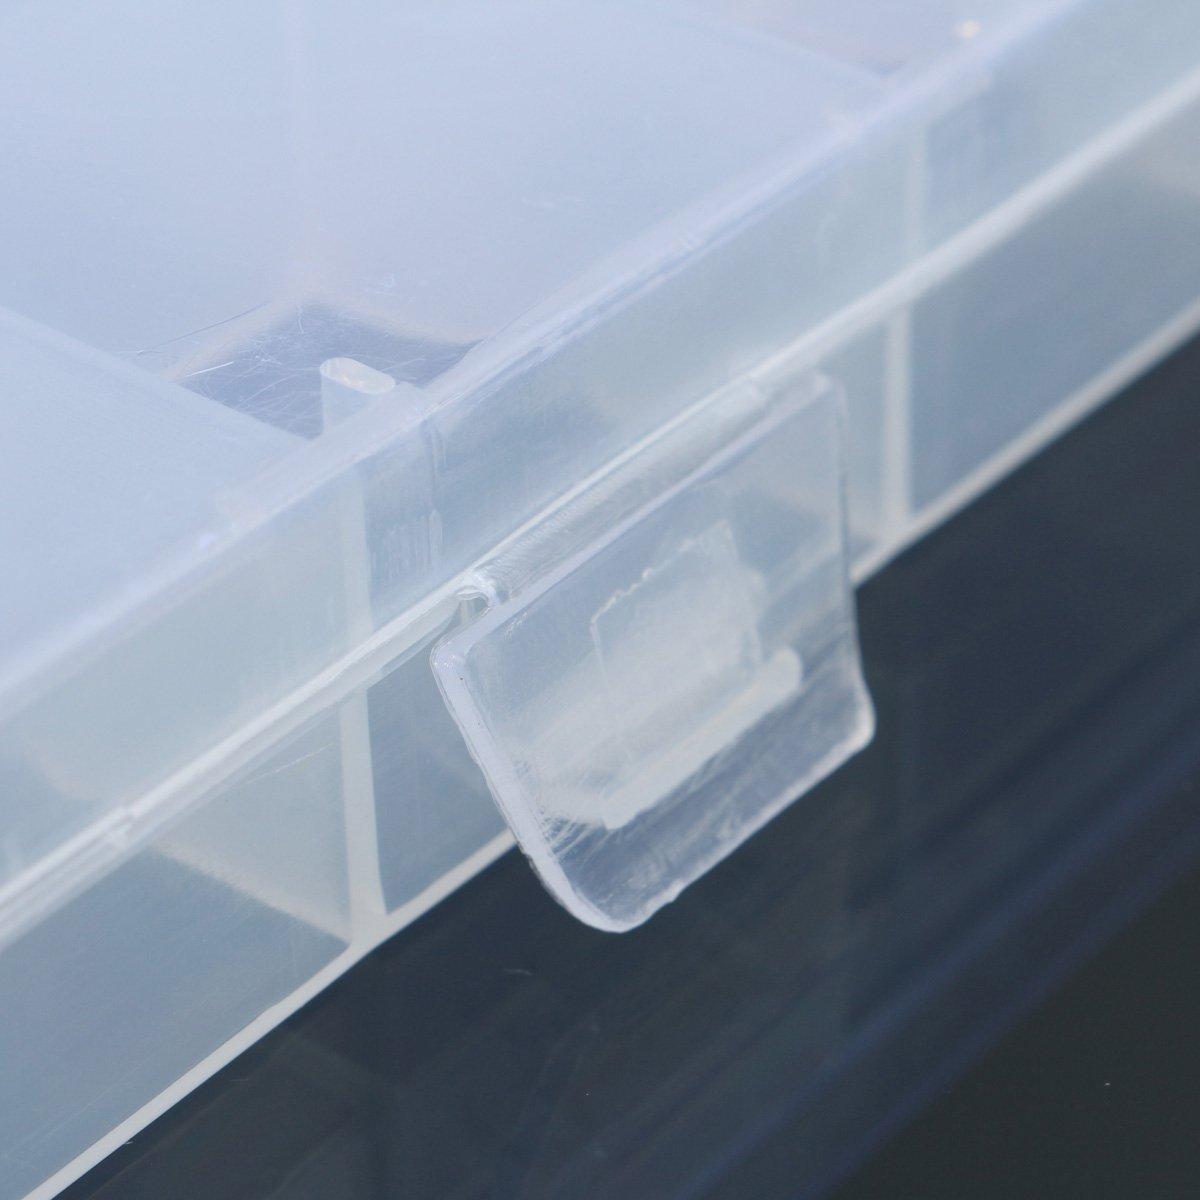 SODIAL 24 Compartments Plastic Box Case Jewelry Bead Storage Container Craft Organizer